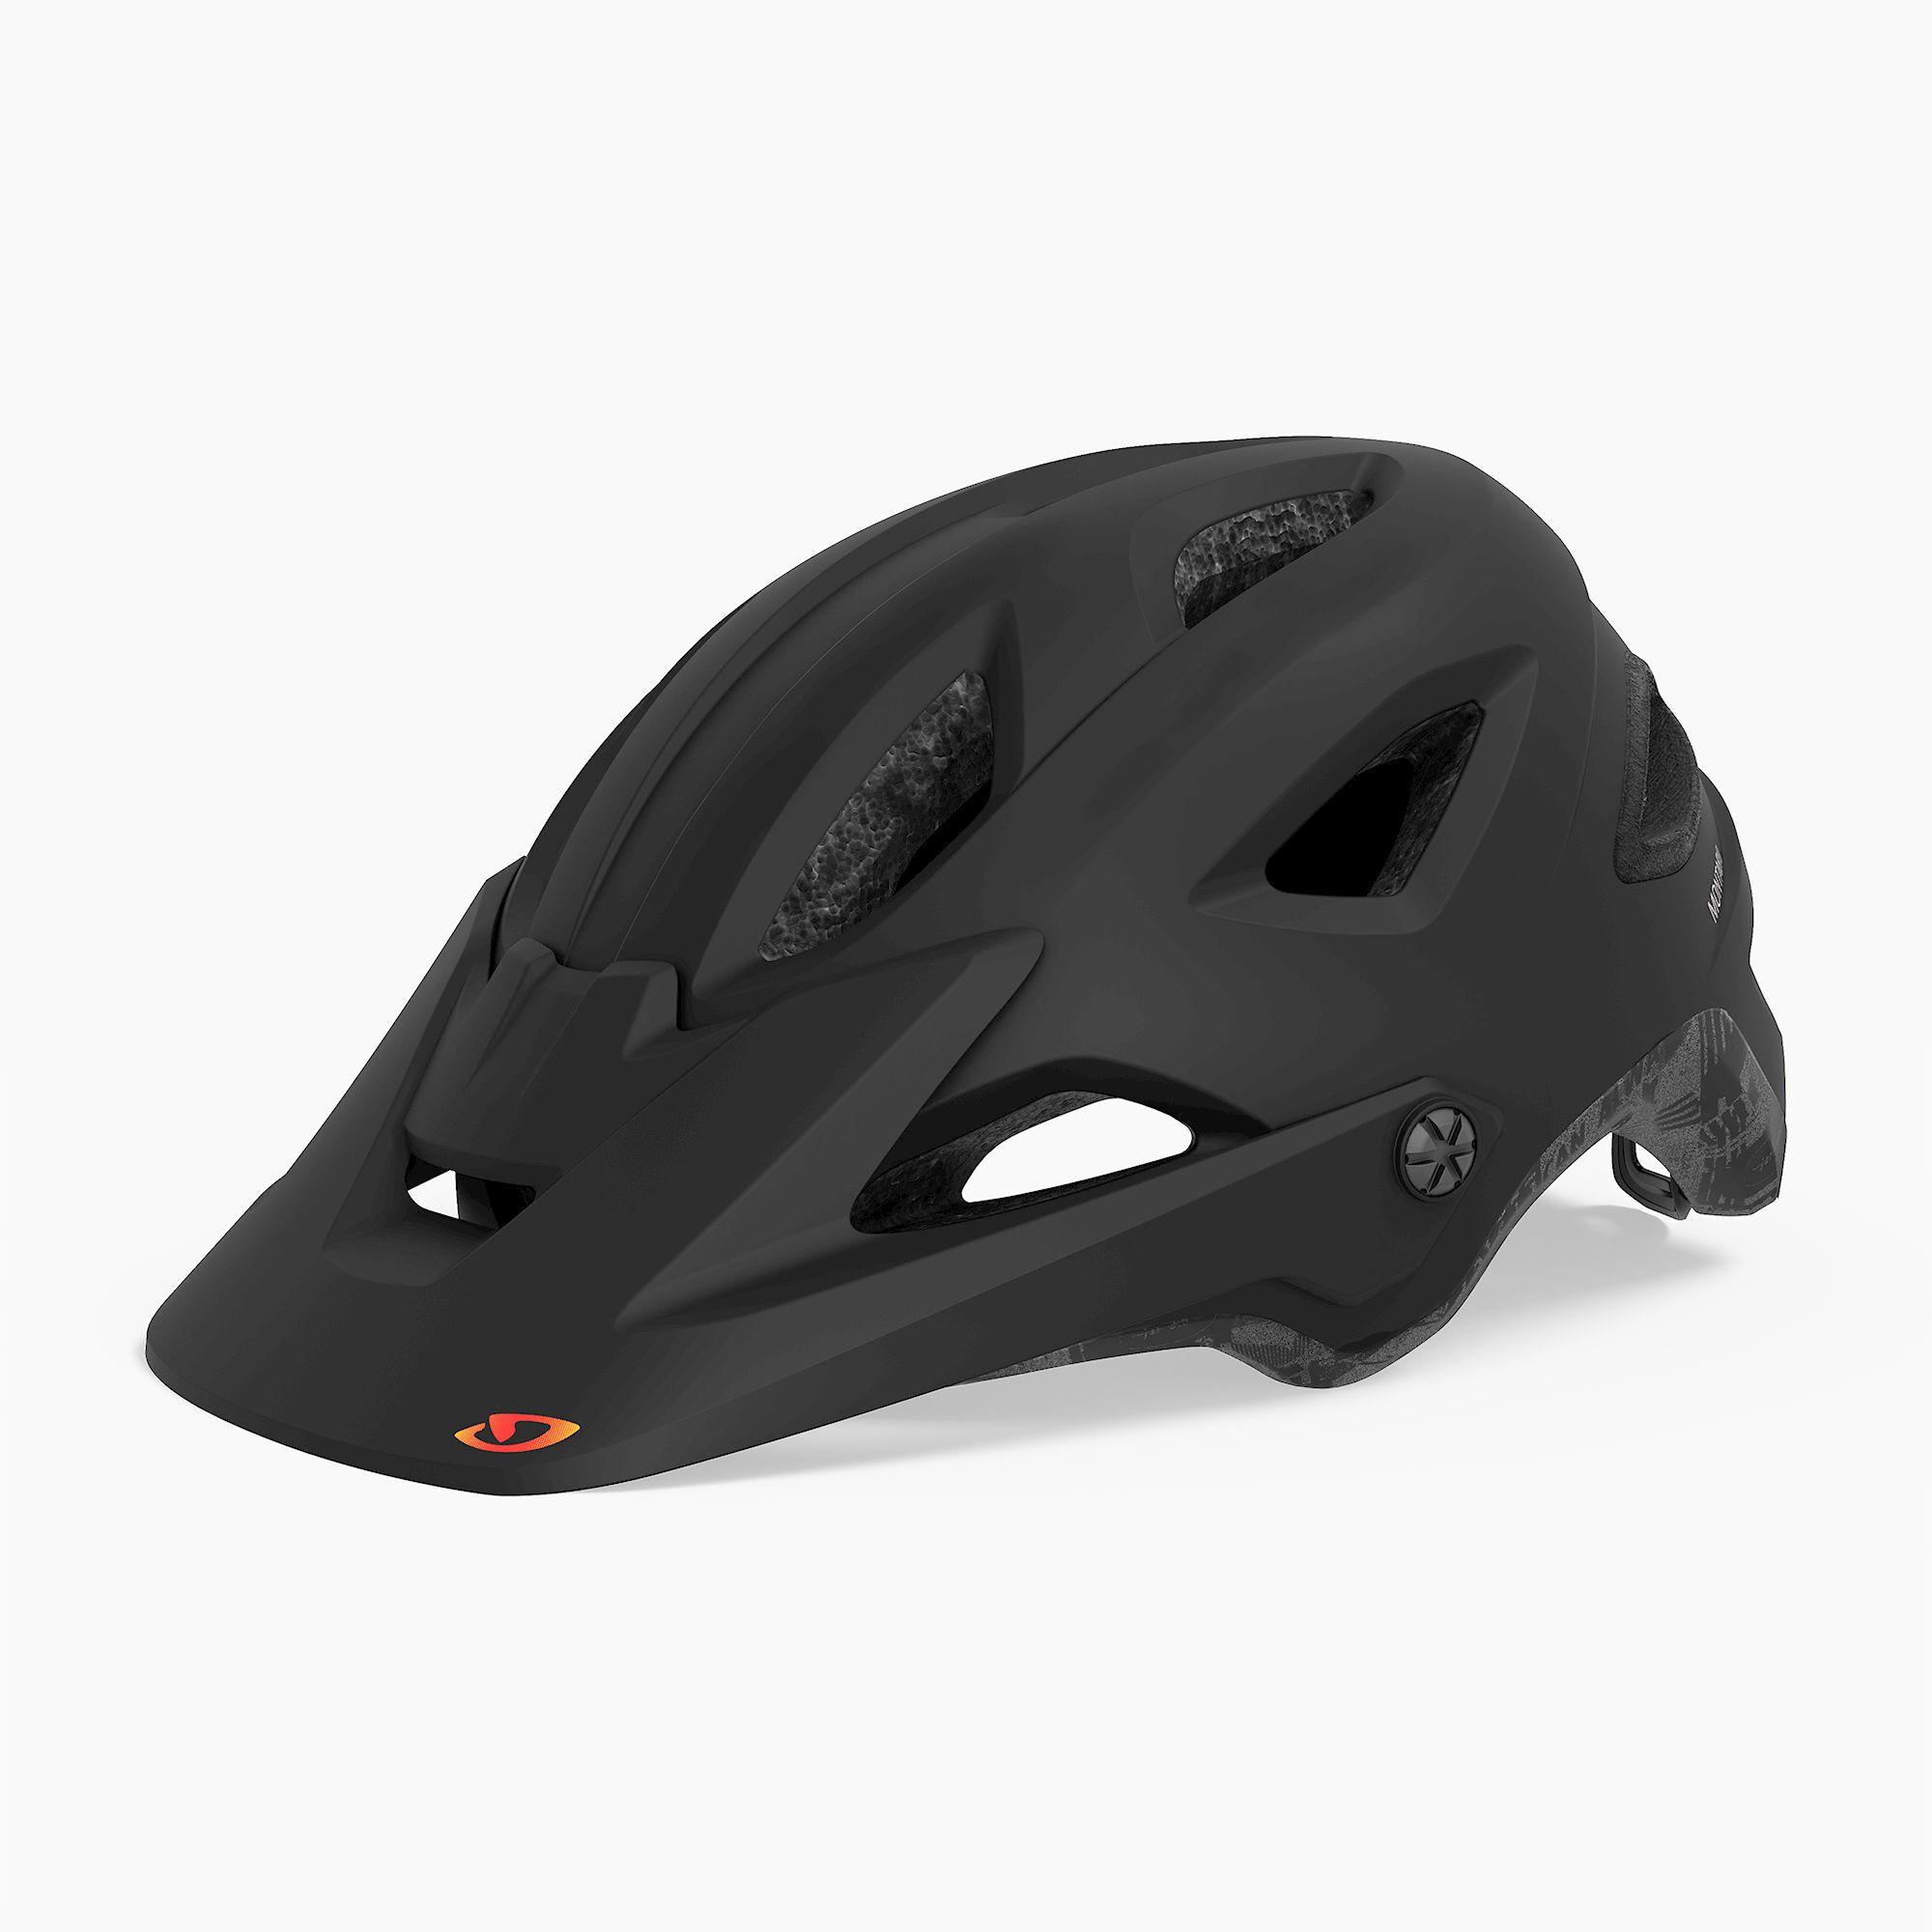 Giro Montaro Pad Kit Black Medium 2018 Black MEDIUM